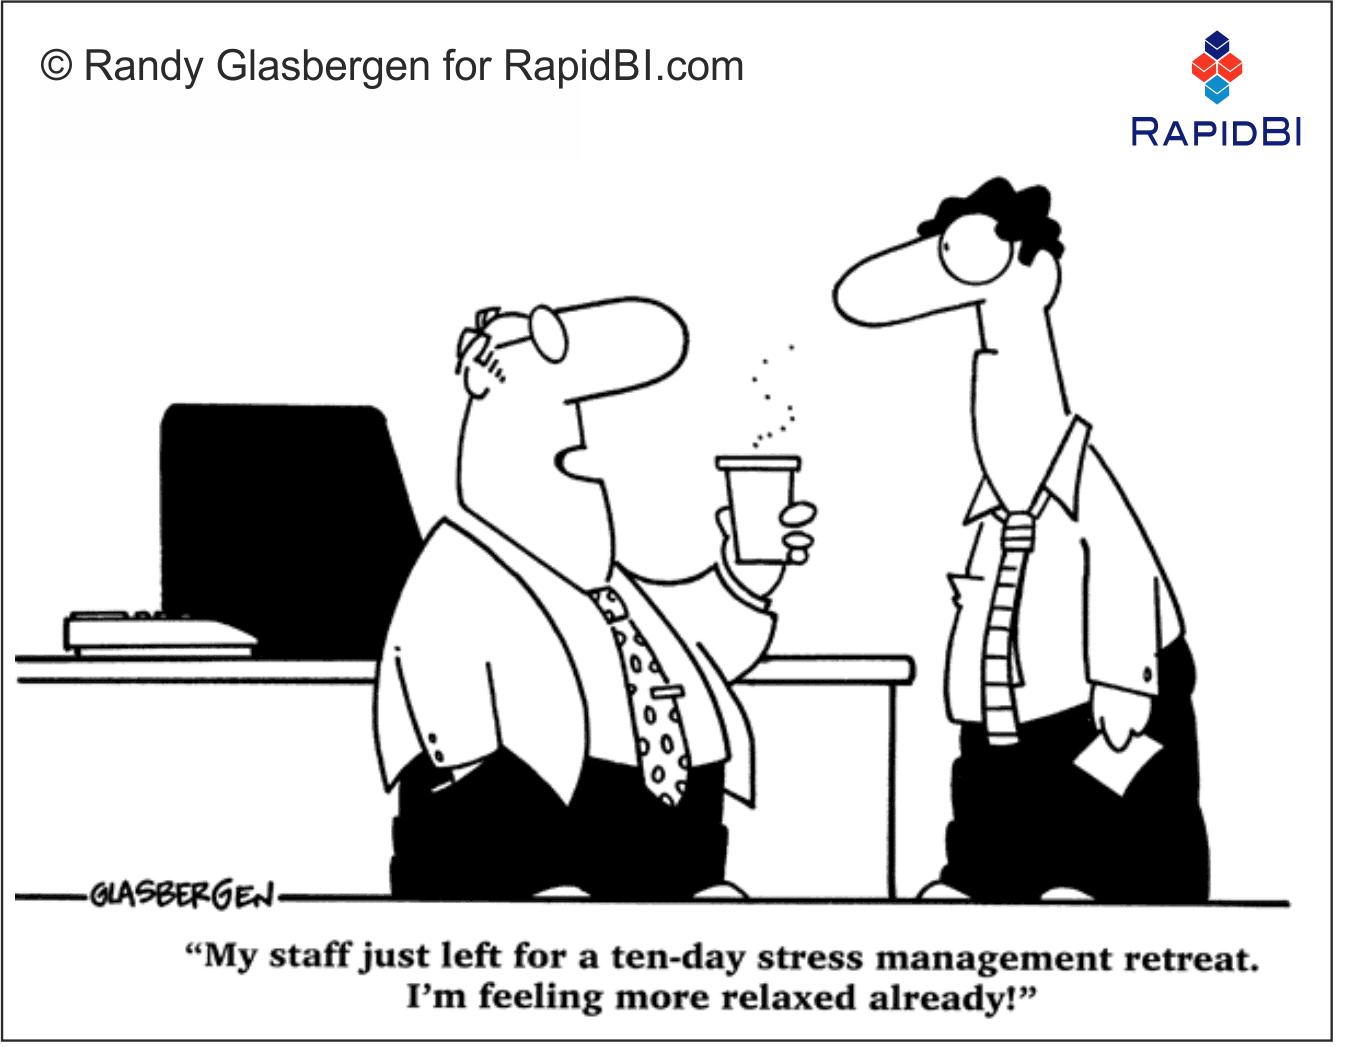 RapidBI Daily Business Cartoon #123